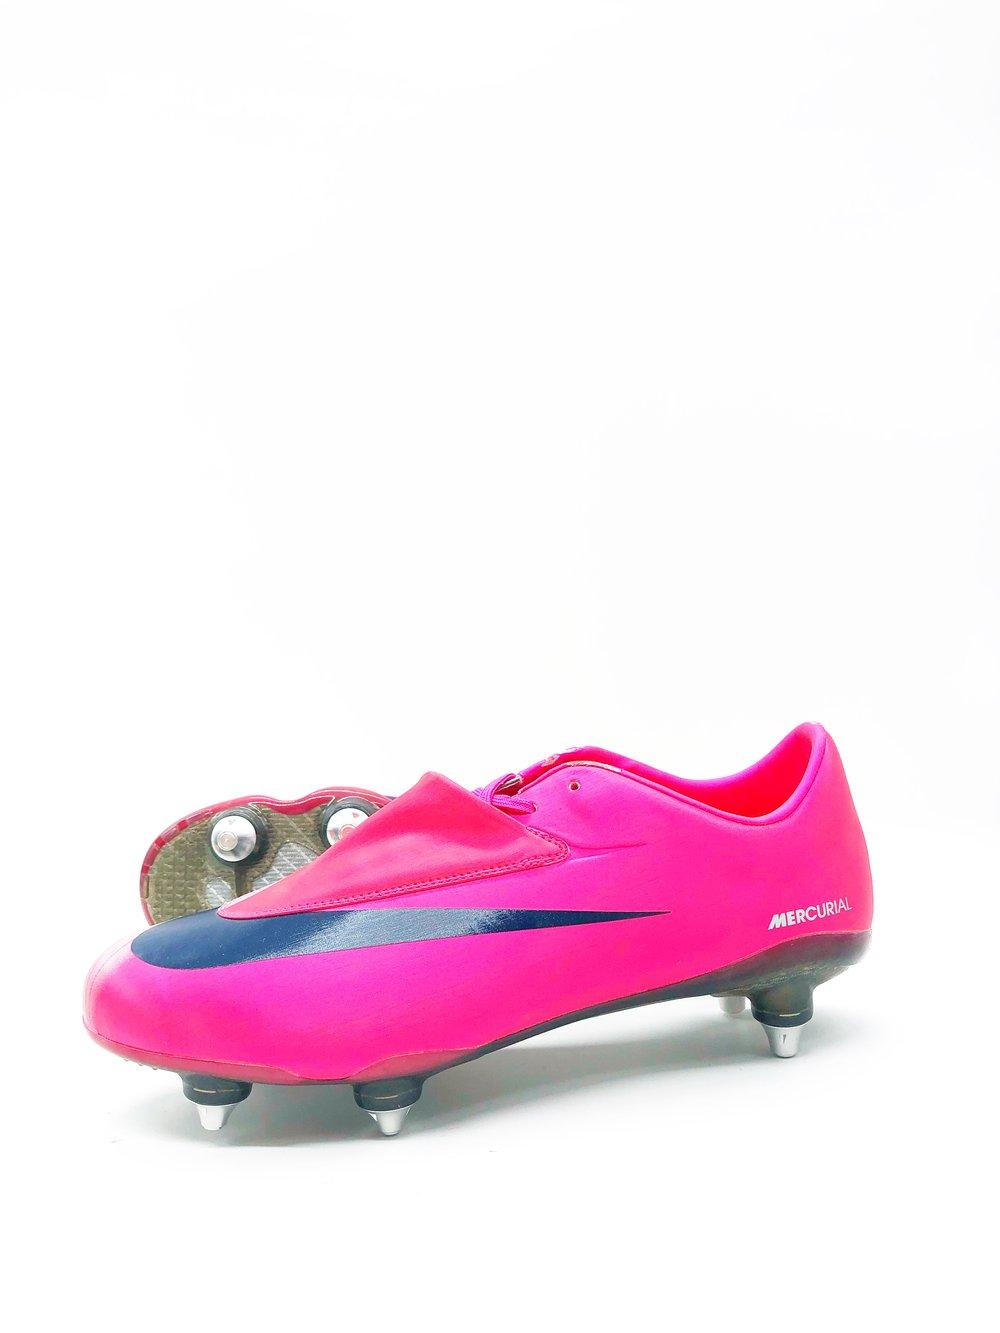 Image of Nike vapor VI SG